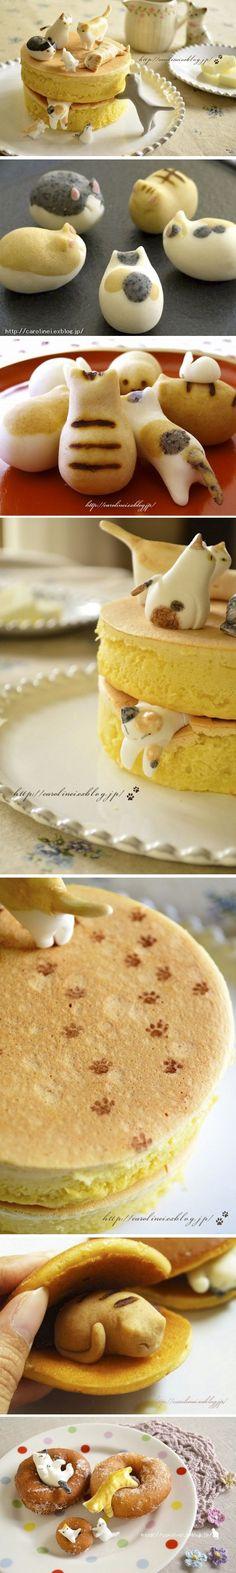 hotcakes loaded with cat-shaped nerikiri, a traditional Japanese sweet | Artisan: Caroline I., Japan |